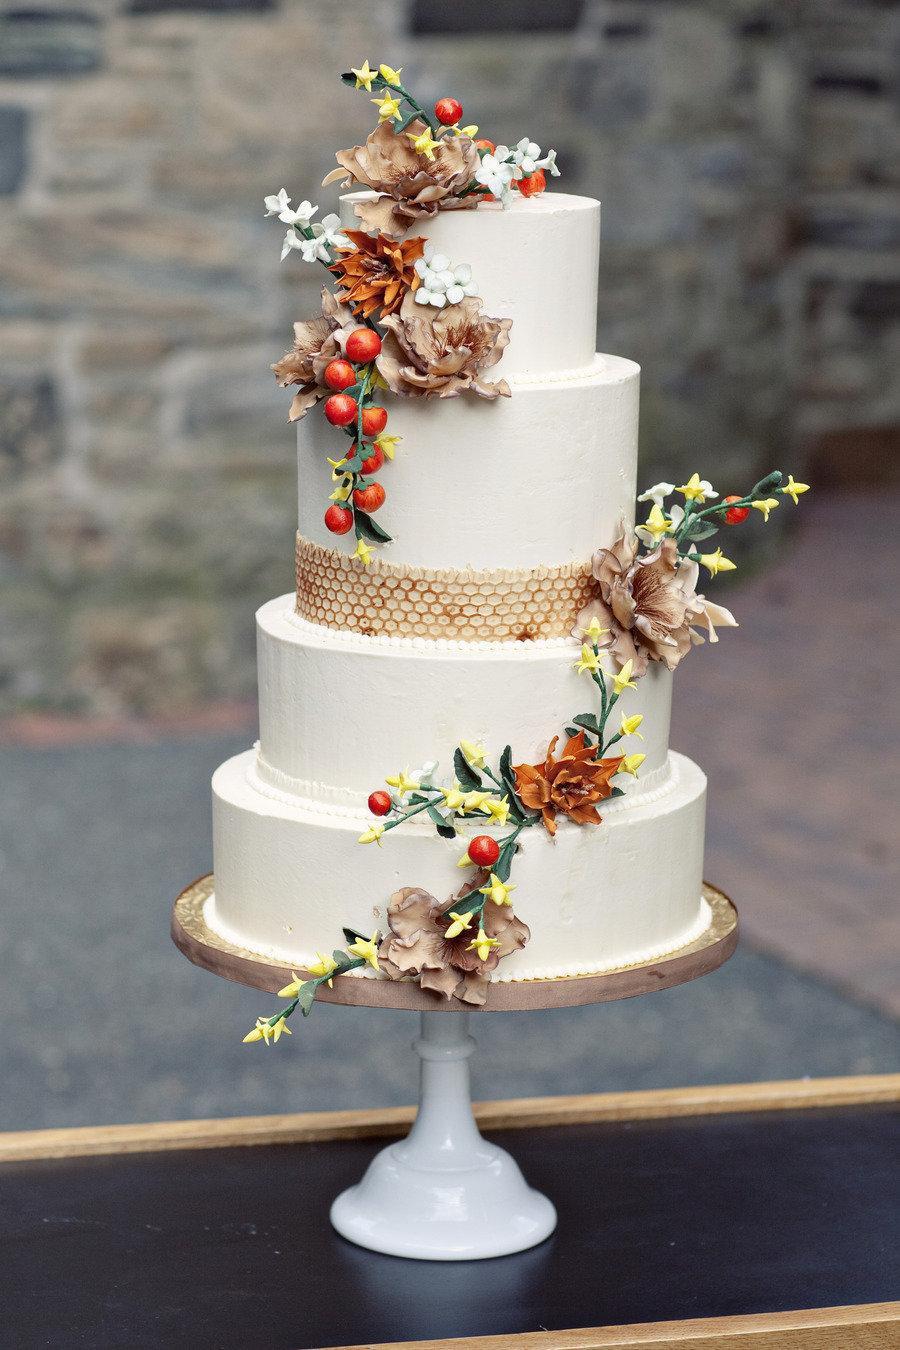 Unique Wedding Cakes Ideas  Delightful Wedding Cake Ideas With Unique Details Weddbook